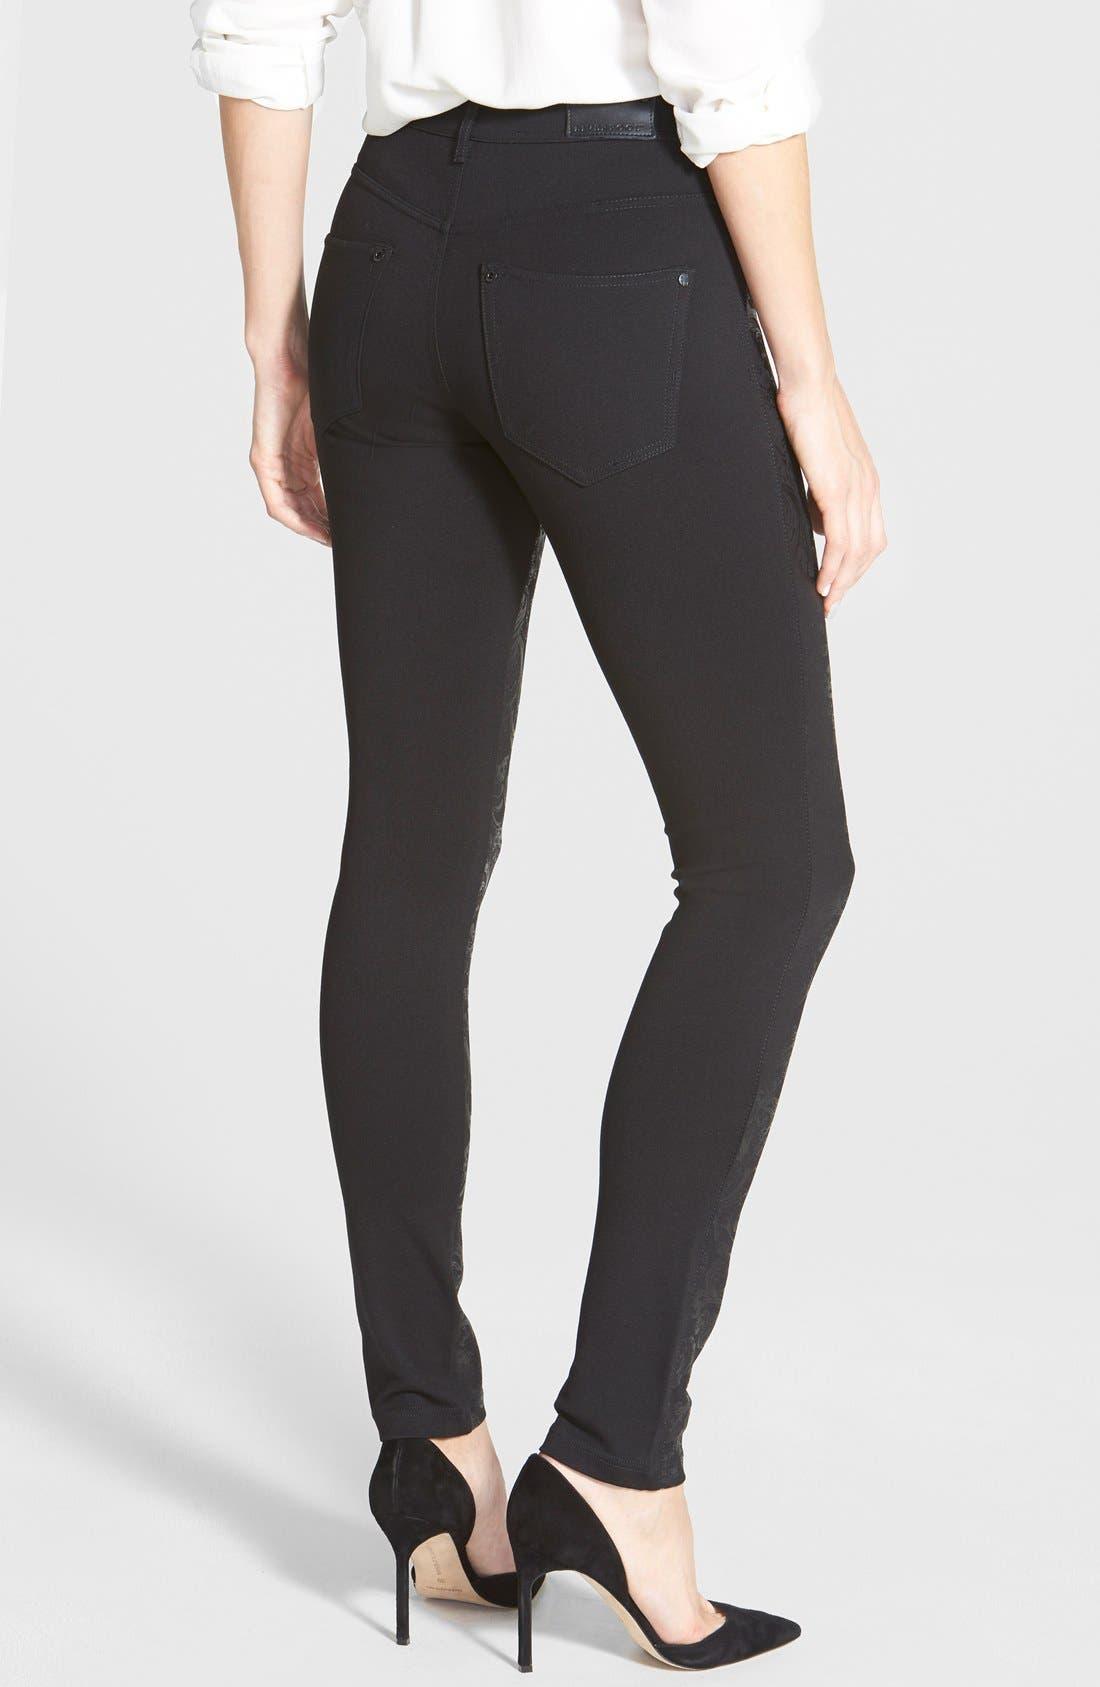 Alternate Image 2  - Liverpool Jeans Company 'Madonna' Gloss Print Stretch Knit Skinny Pants